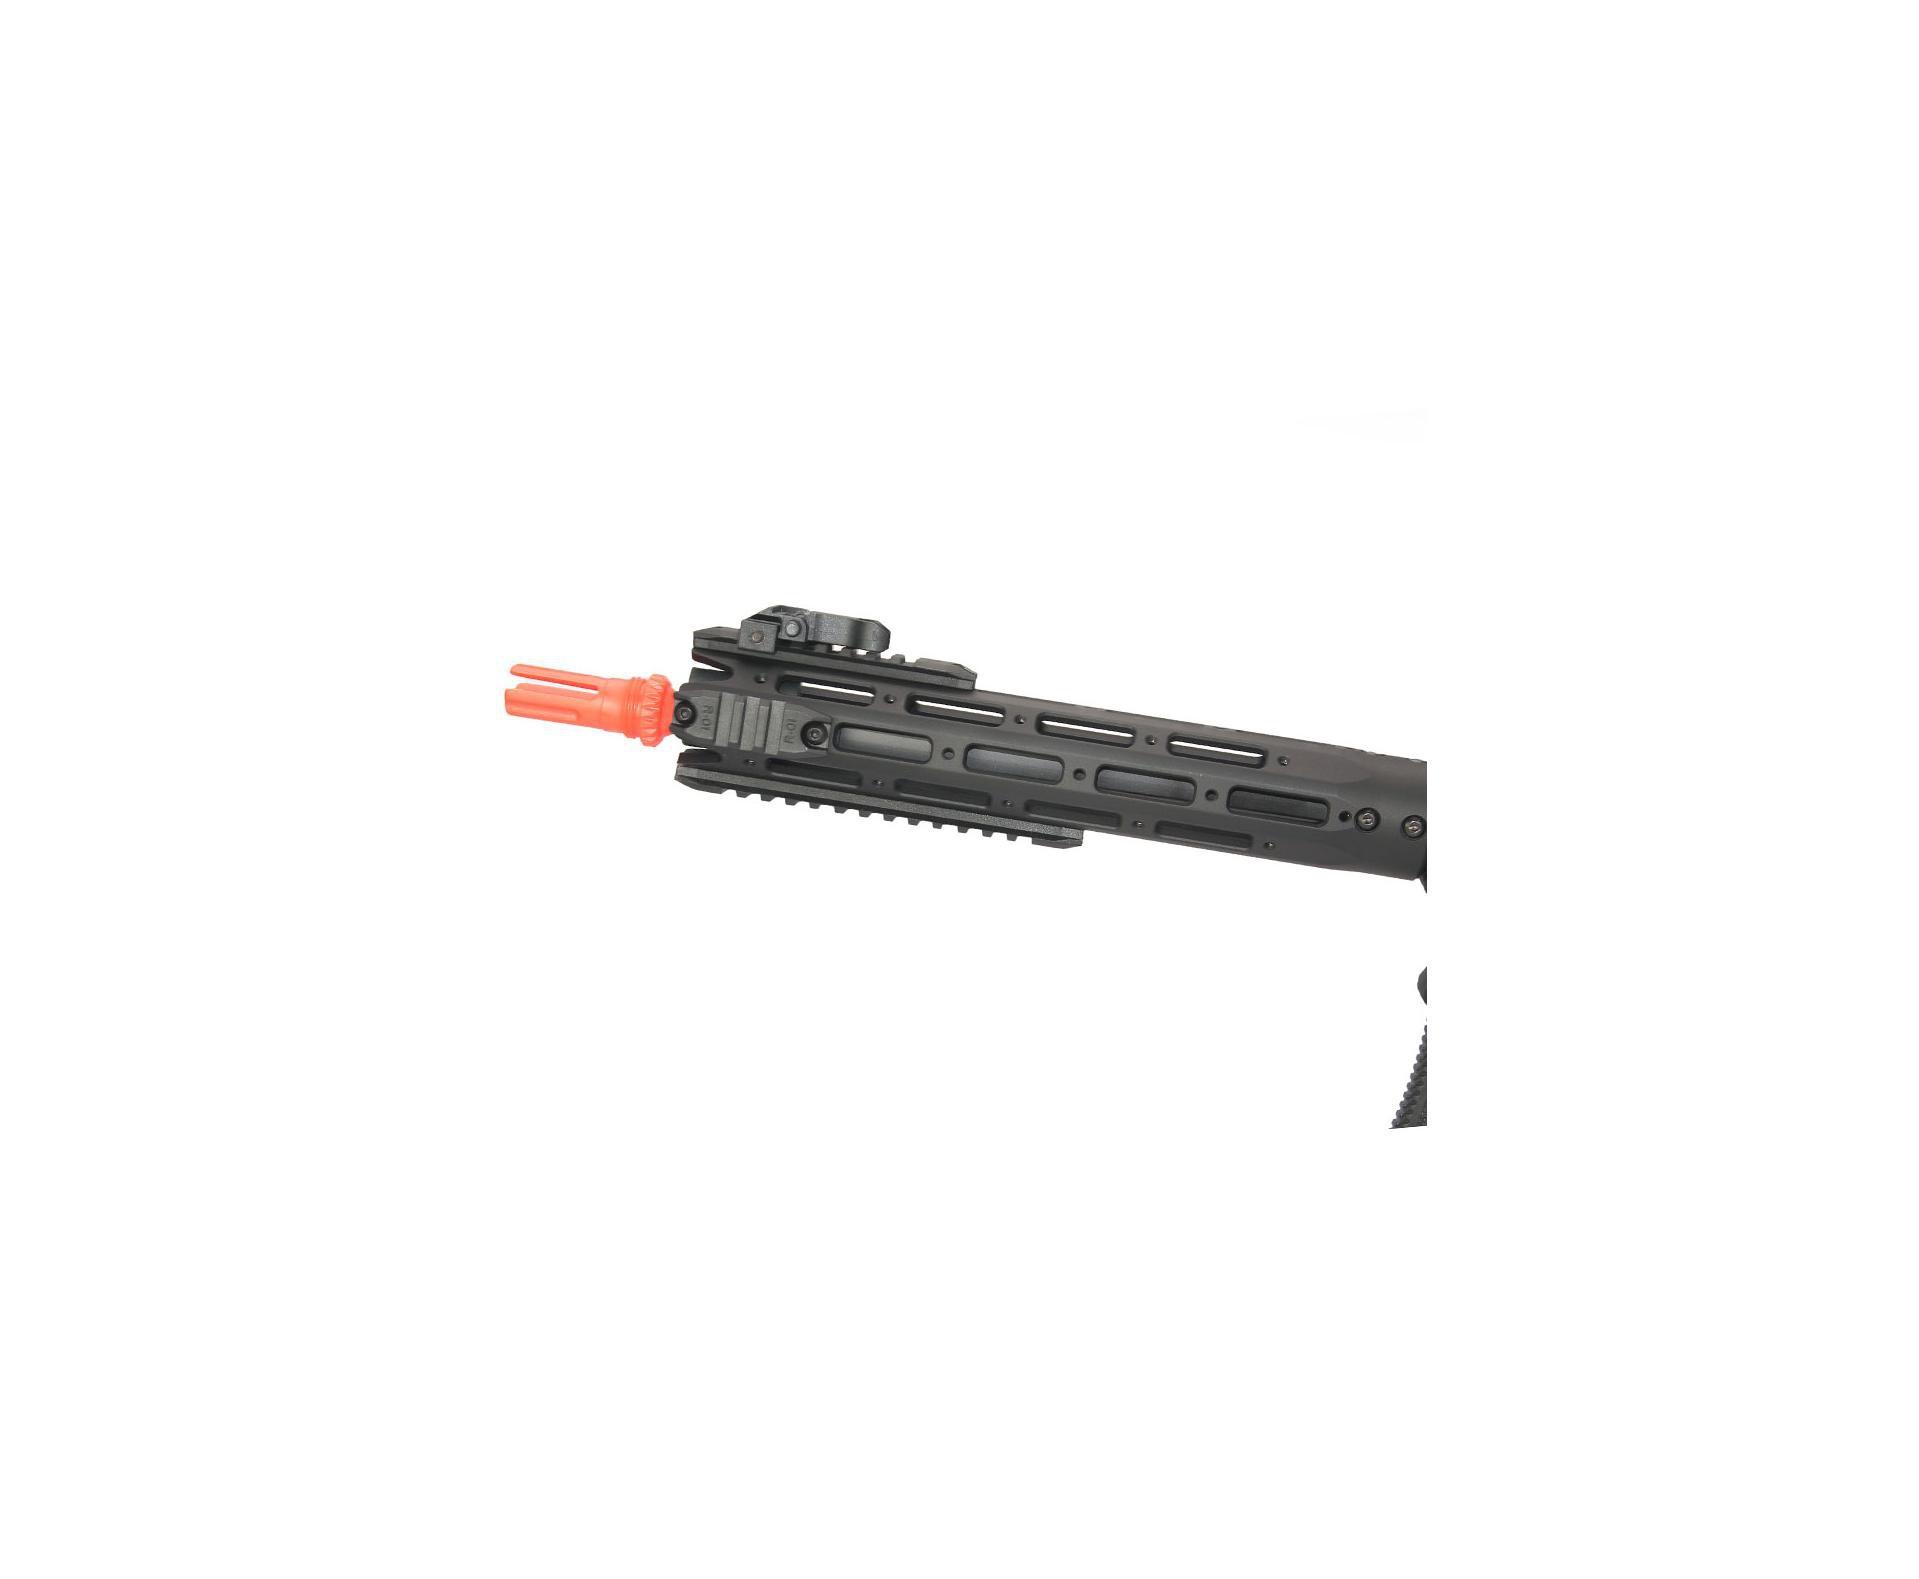 Rifle De Airsoft M4 Ris Long Amoeba Am-009-bk - Cal 6.0mm - Ares